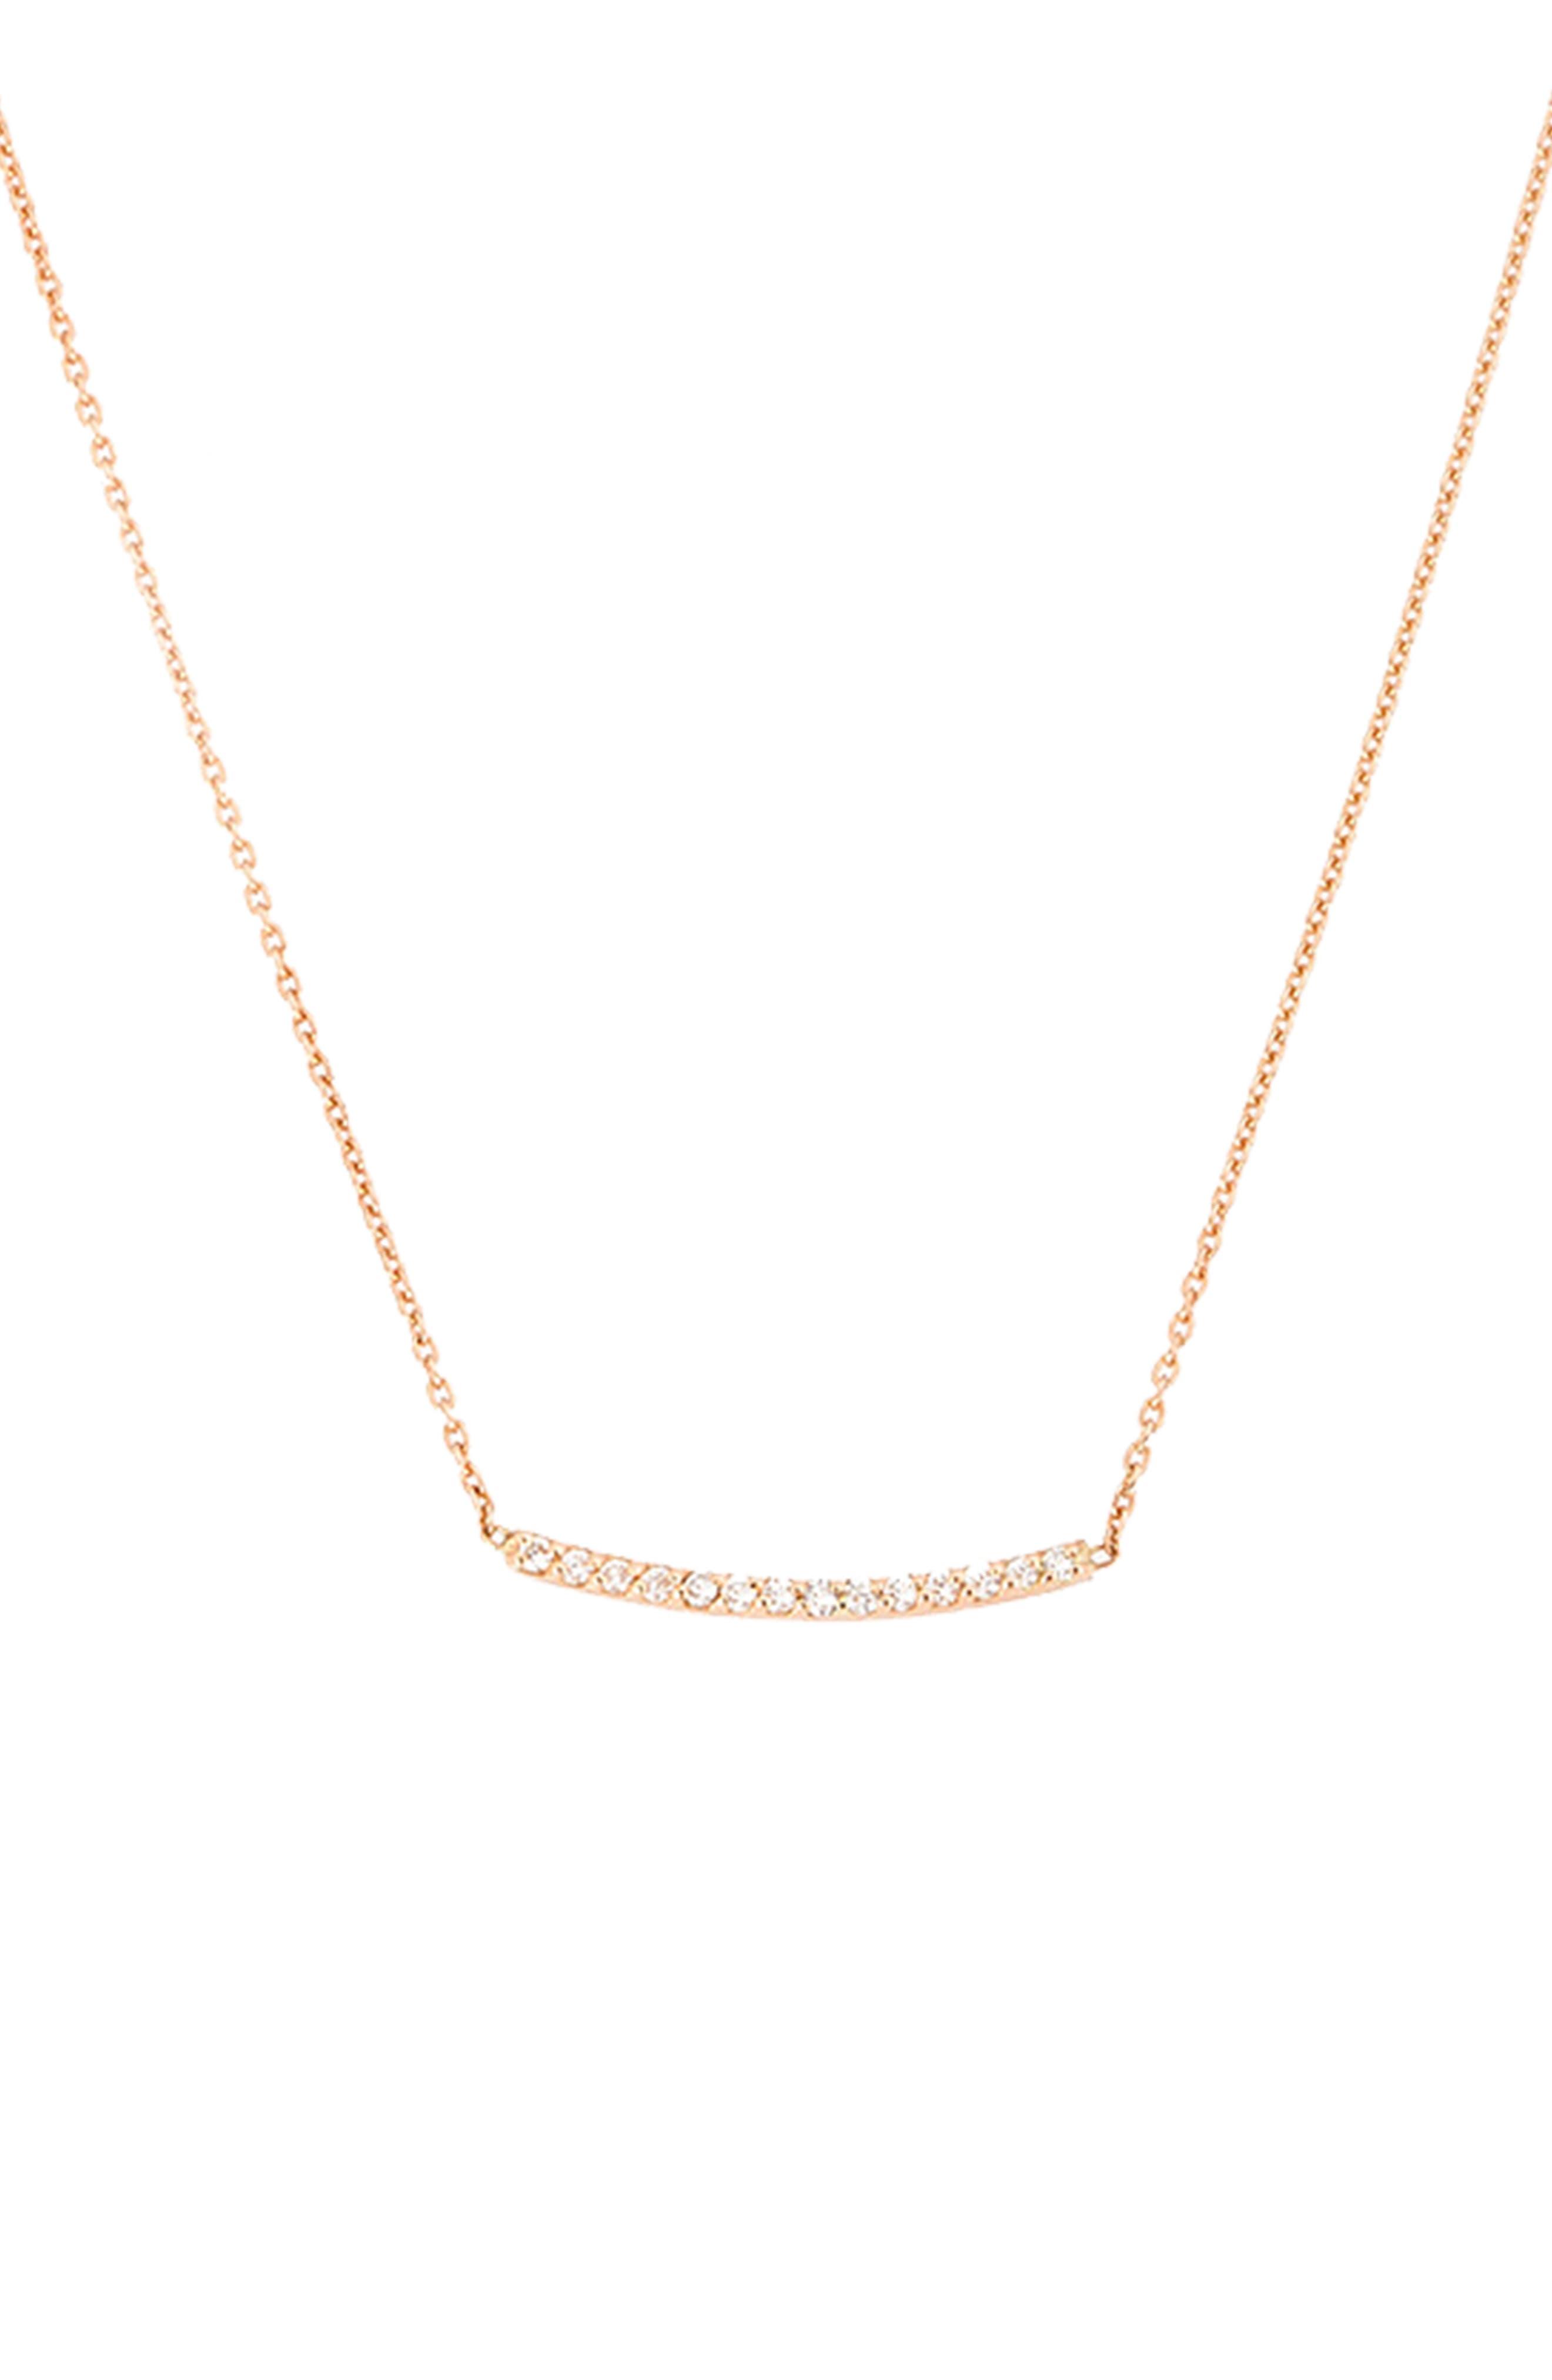 Kismet by Milka Lumiere Diamond Bar Necklace